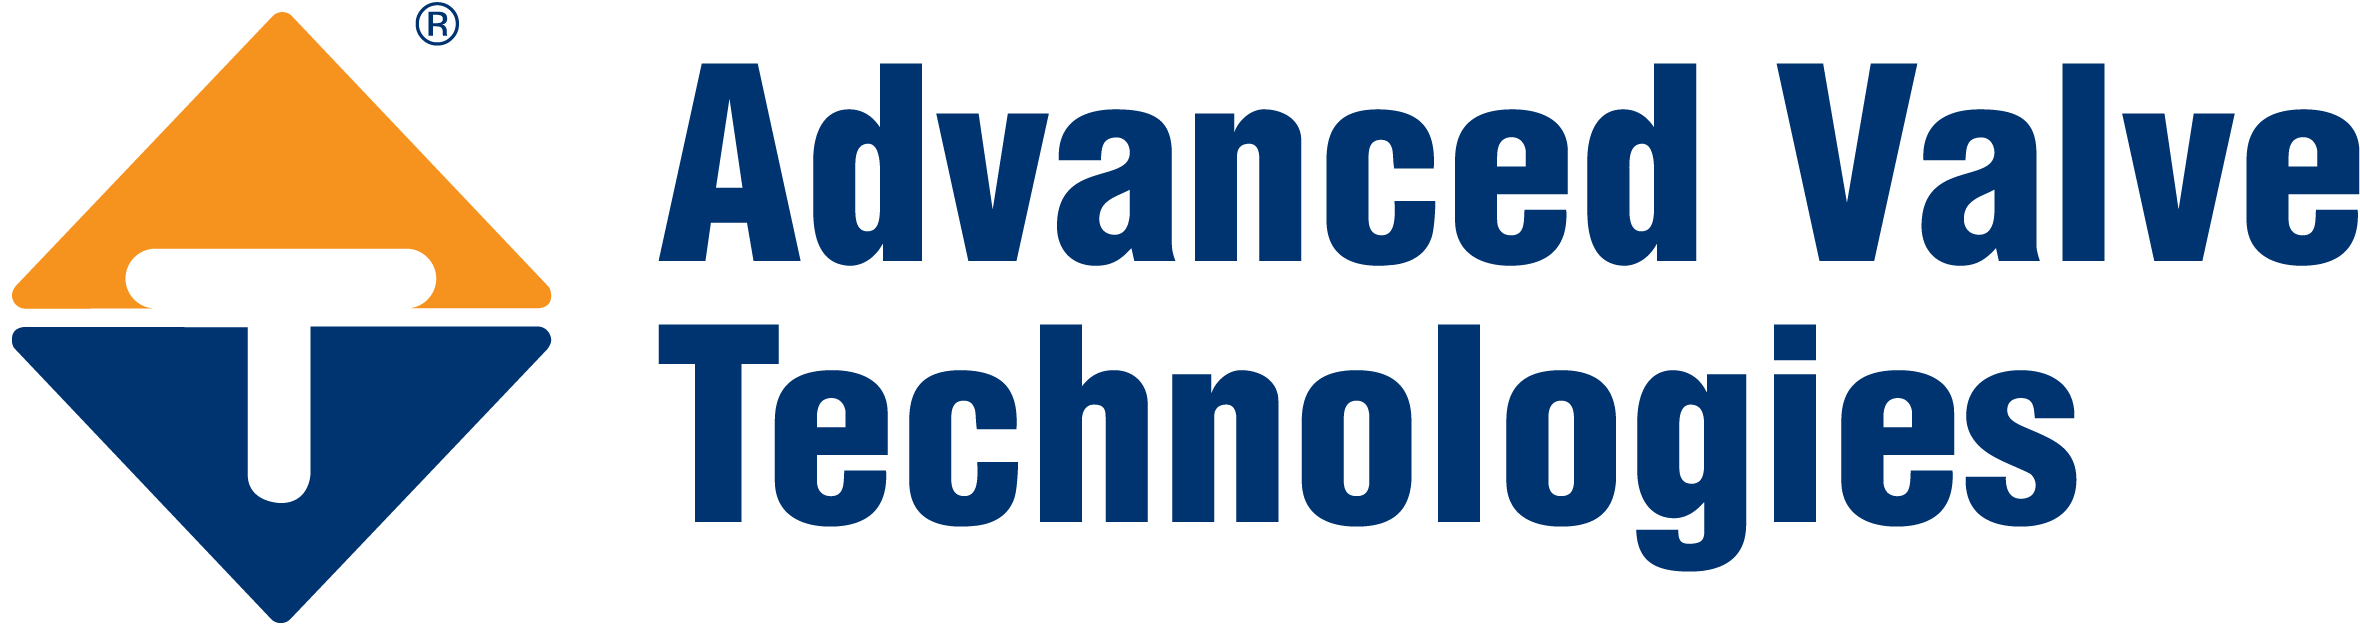 Advanced Valve Technologies training page